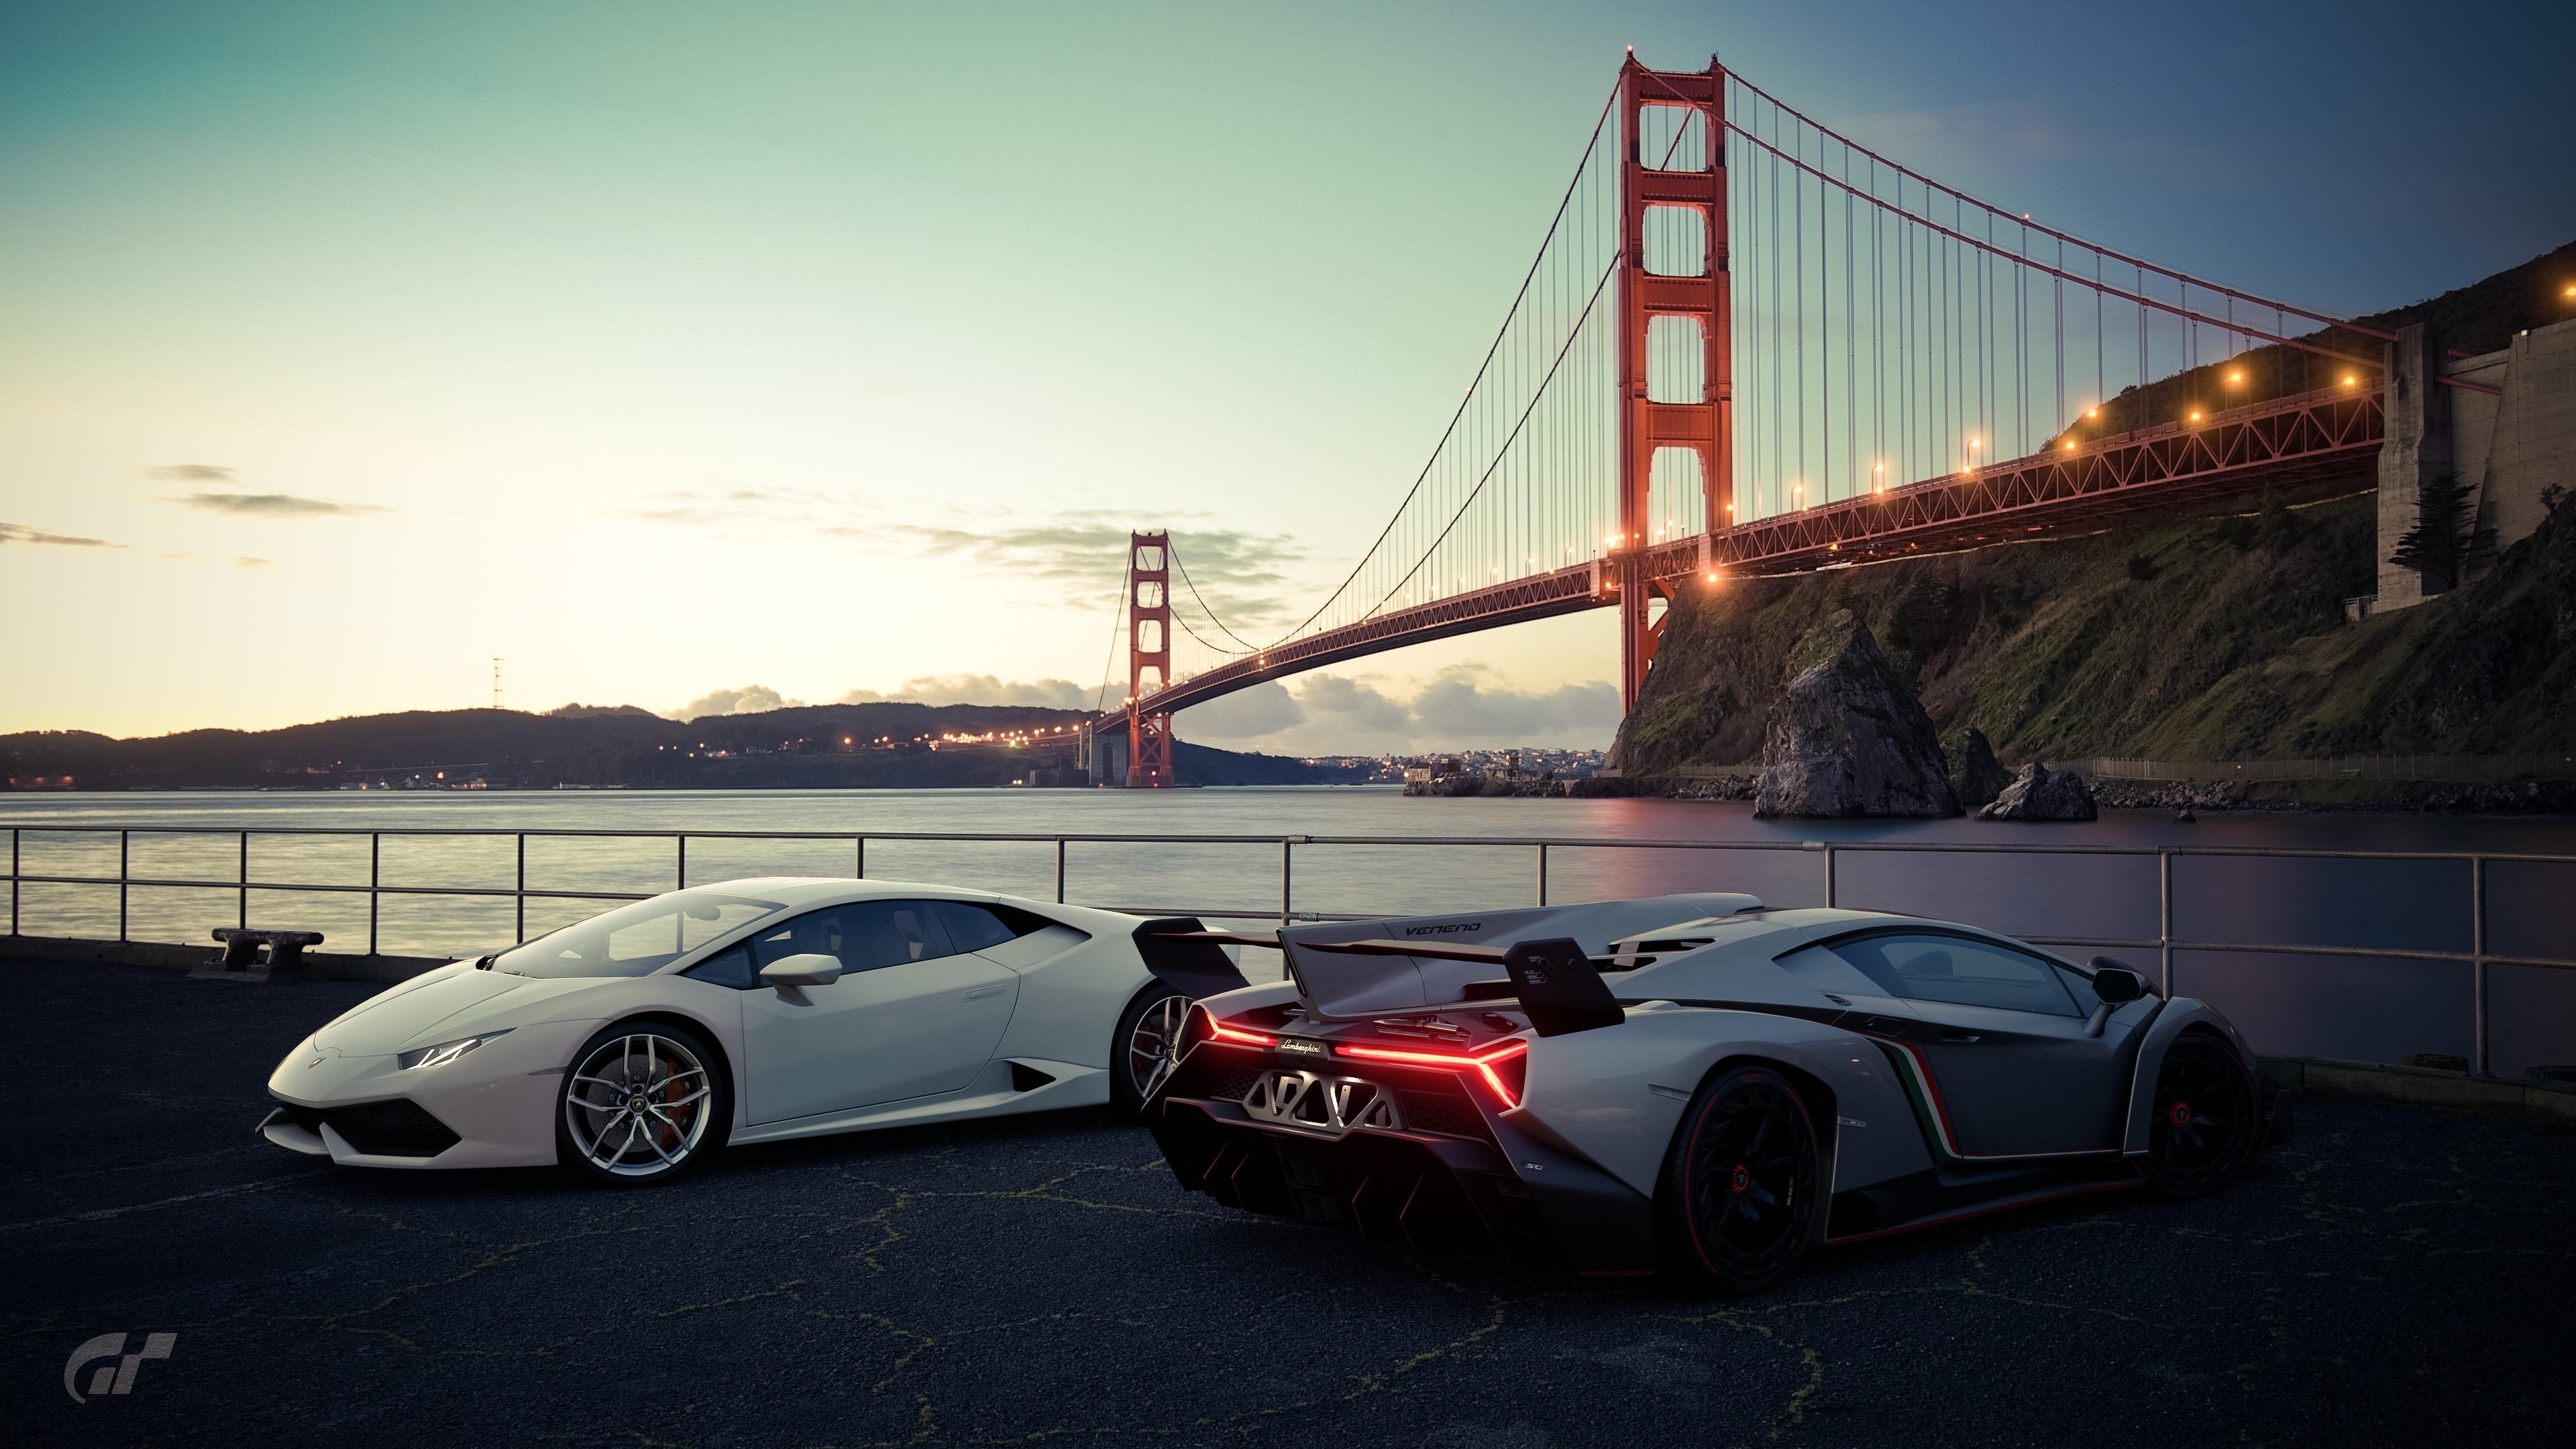 Lamborghini San Francisco >> Wallpaper White And Silver Lamborghini Luxury Sport Cars